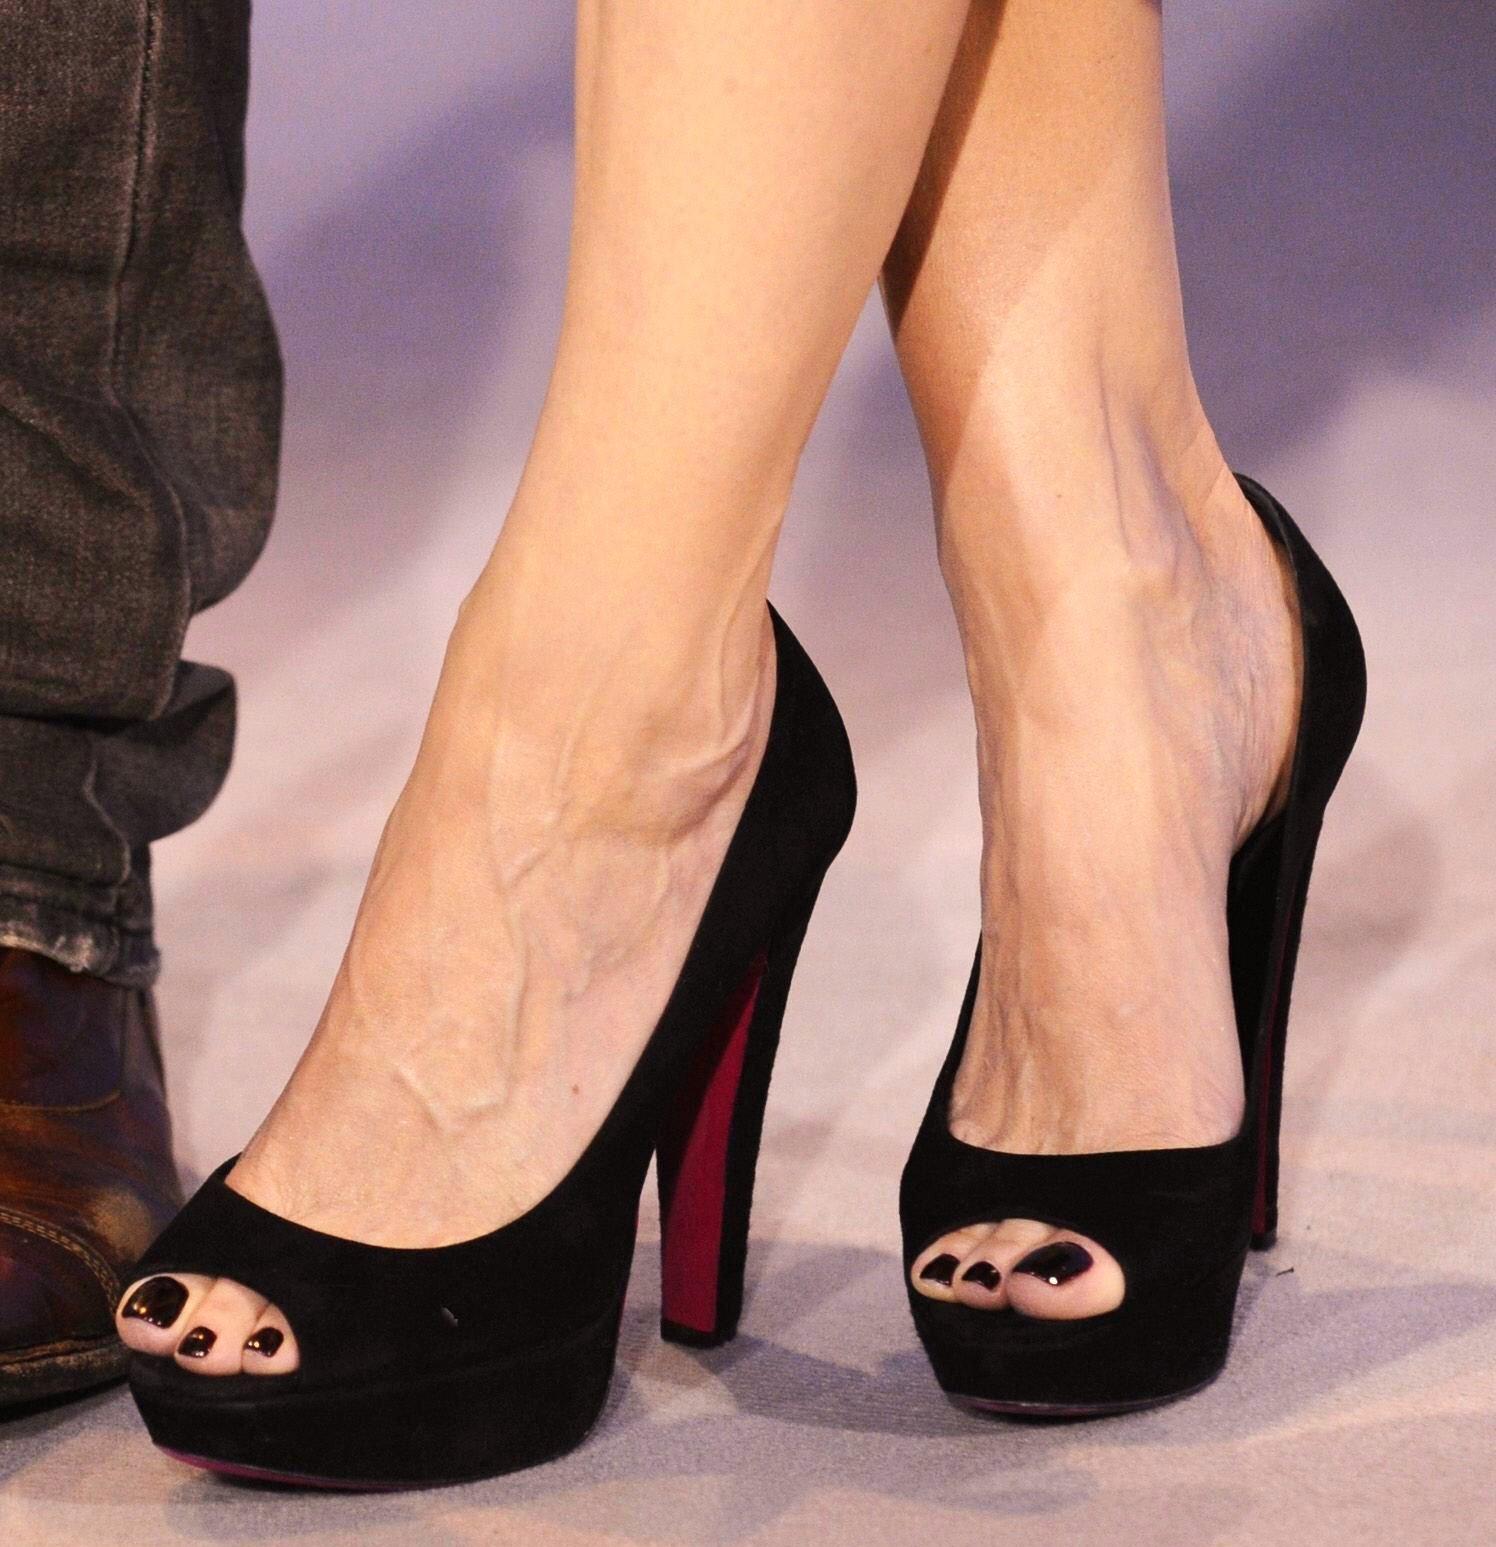 Michelle pfeiffers feet wikifeet 2442367 voltagebd Choice Image